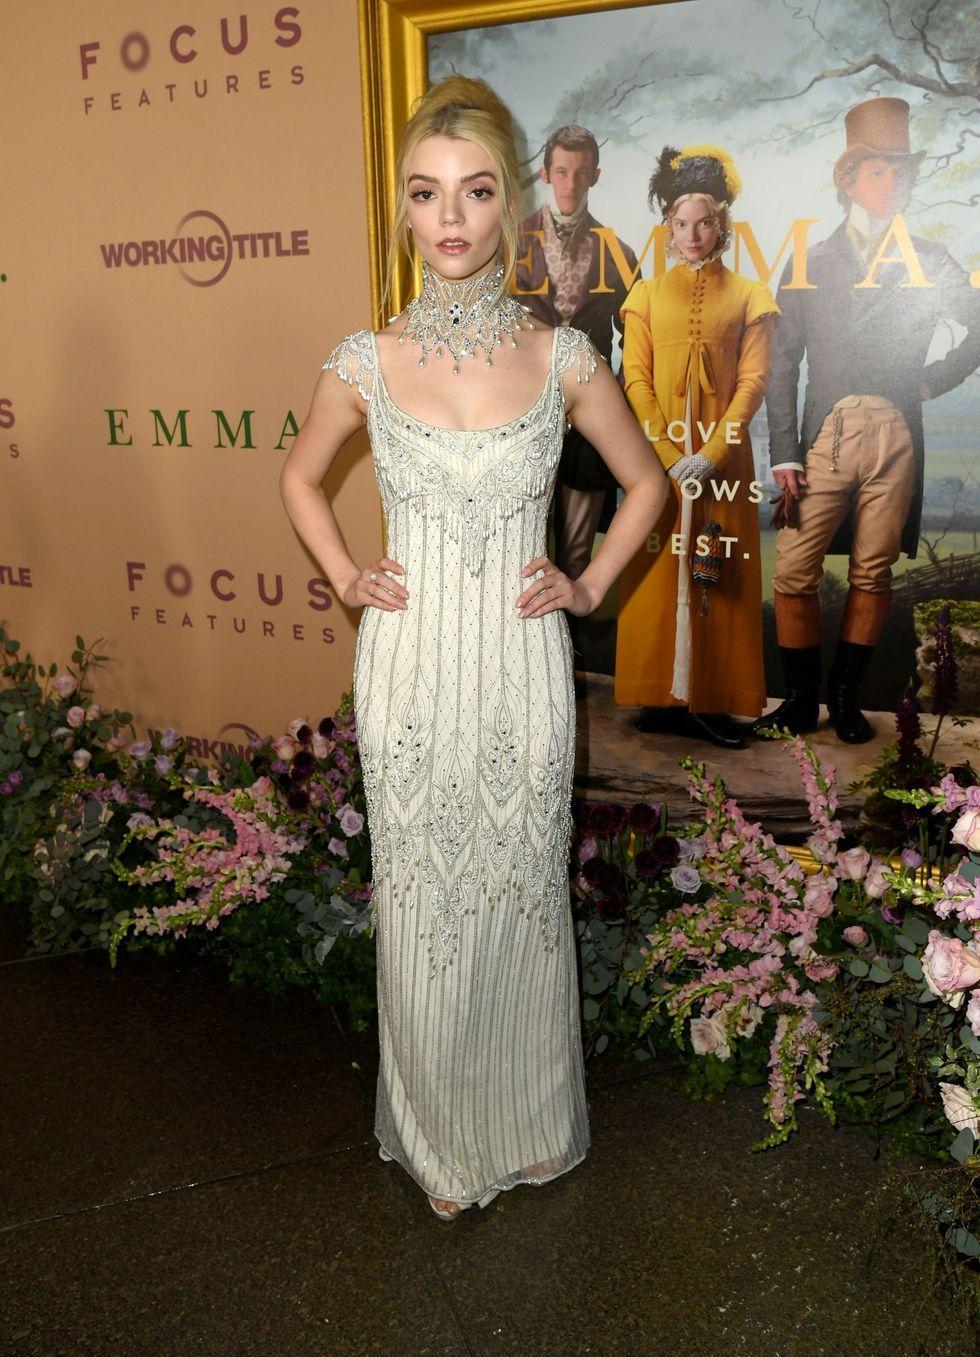 Anya Taylor Joy Wore A Vintage Wedding Dress To The Emma Premiere Anya Taylor Joy Wedding Dresses Vintage Wedding Gowns Vintage